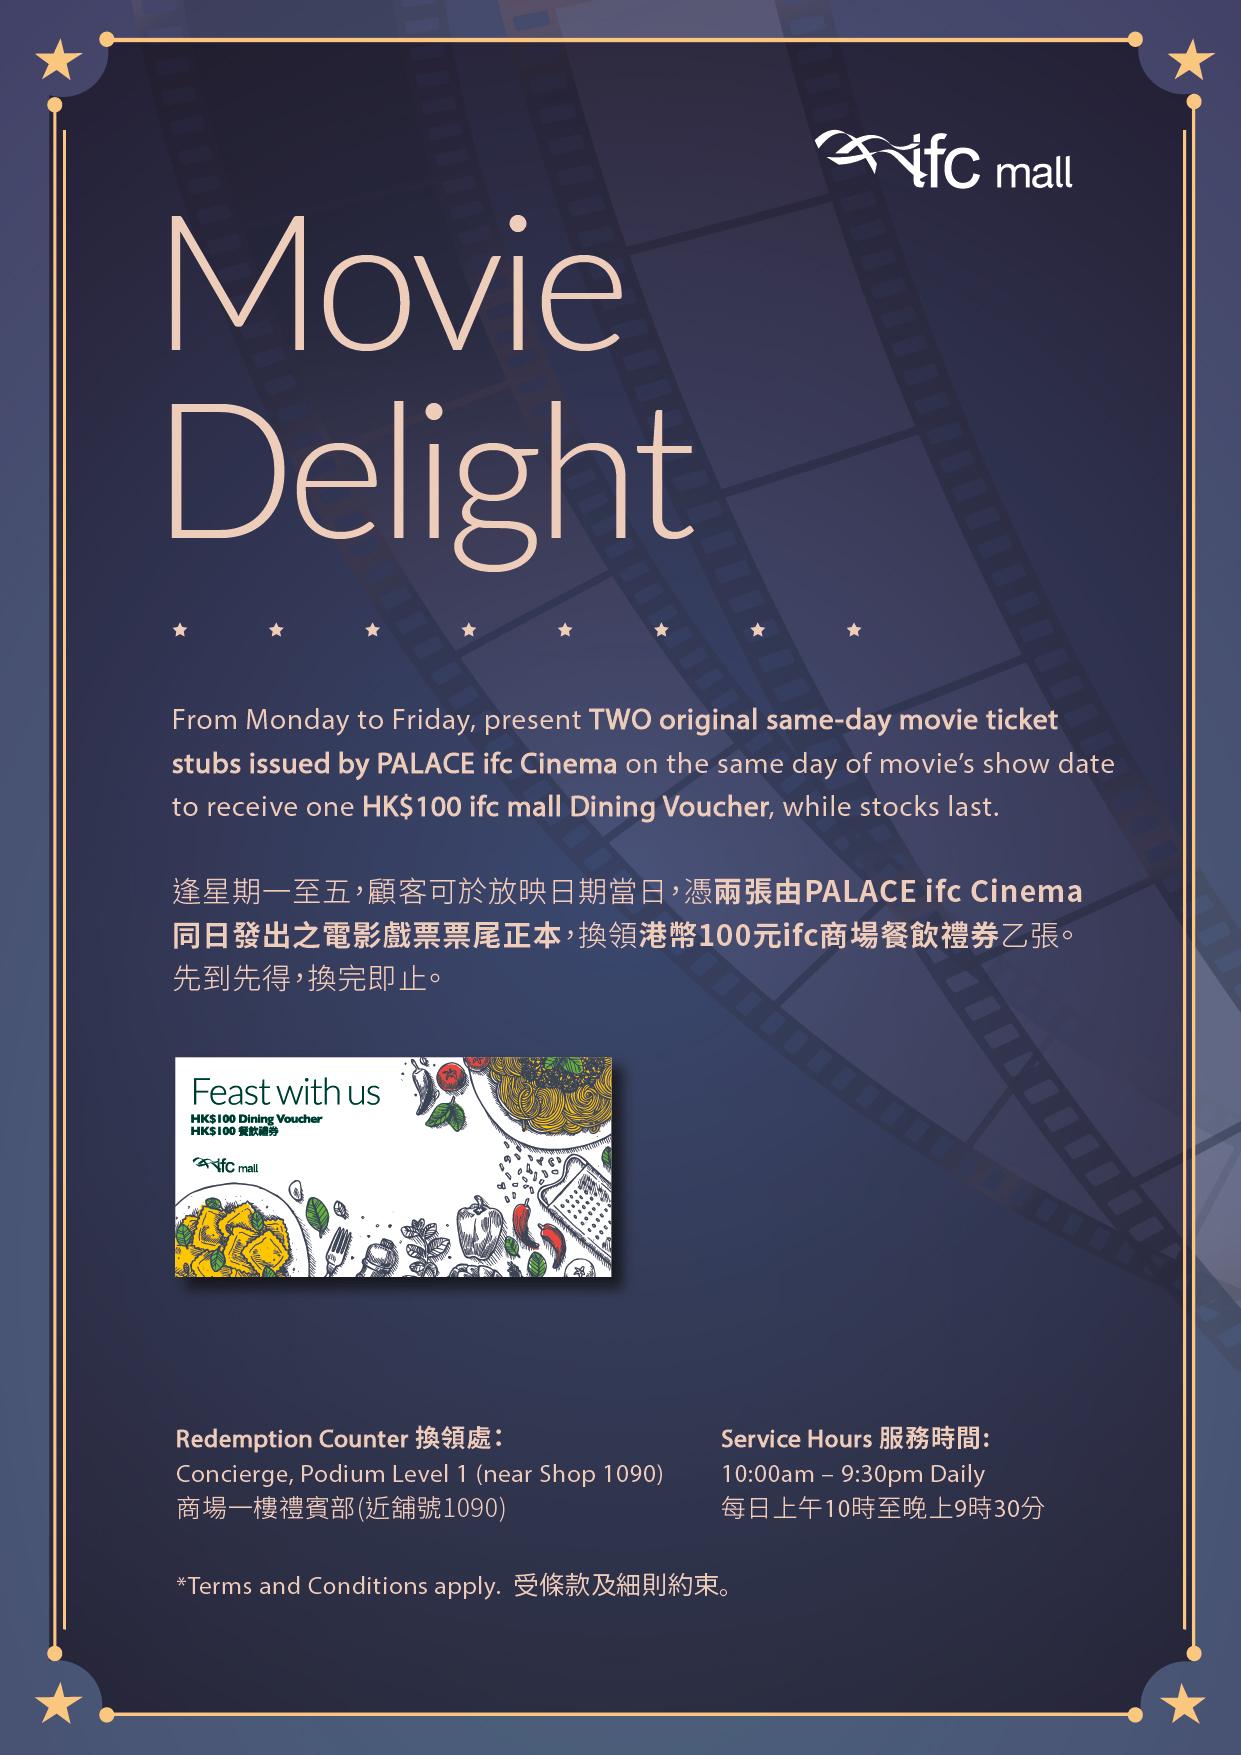 movie_delight-02-02